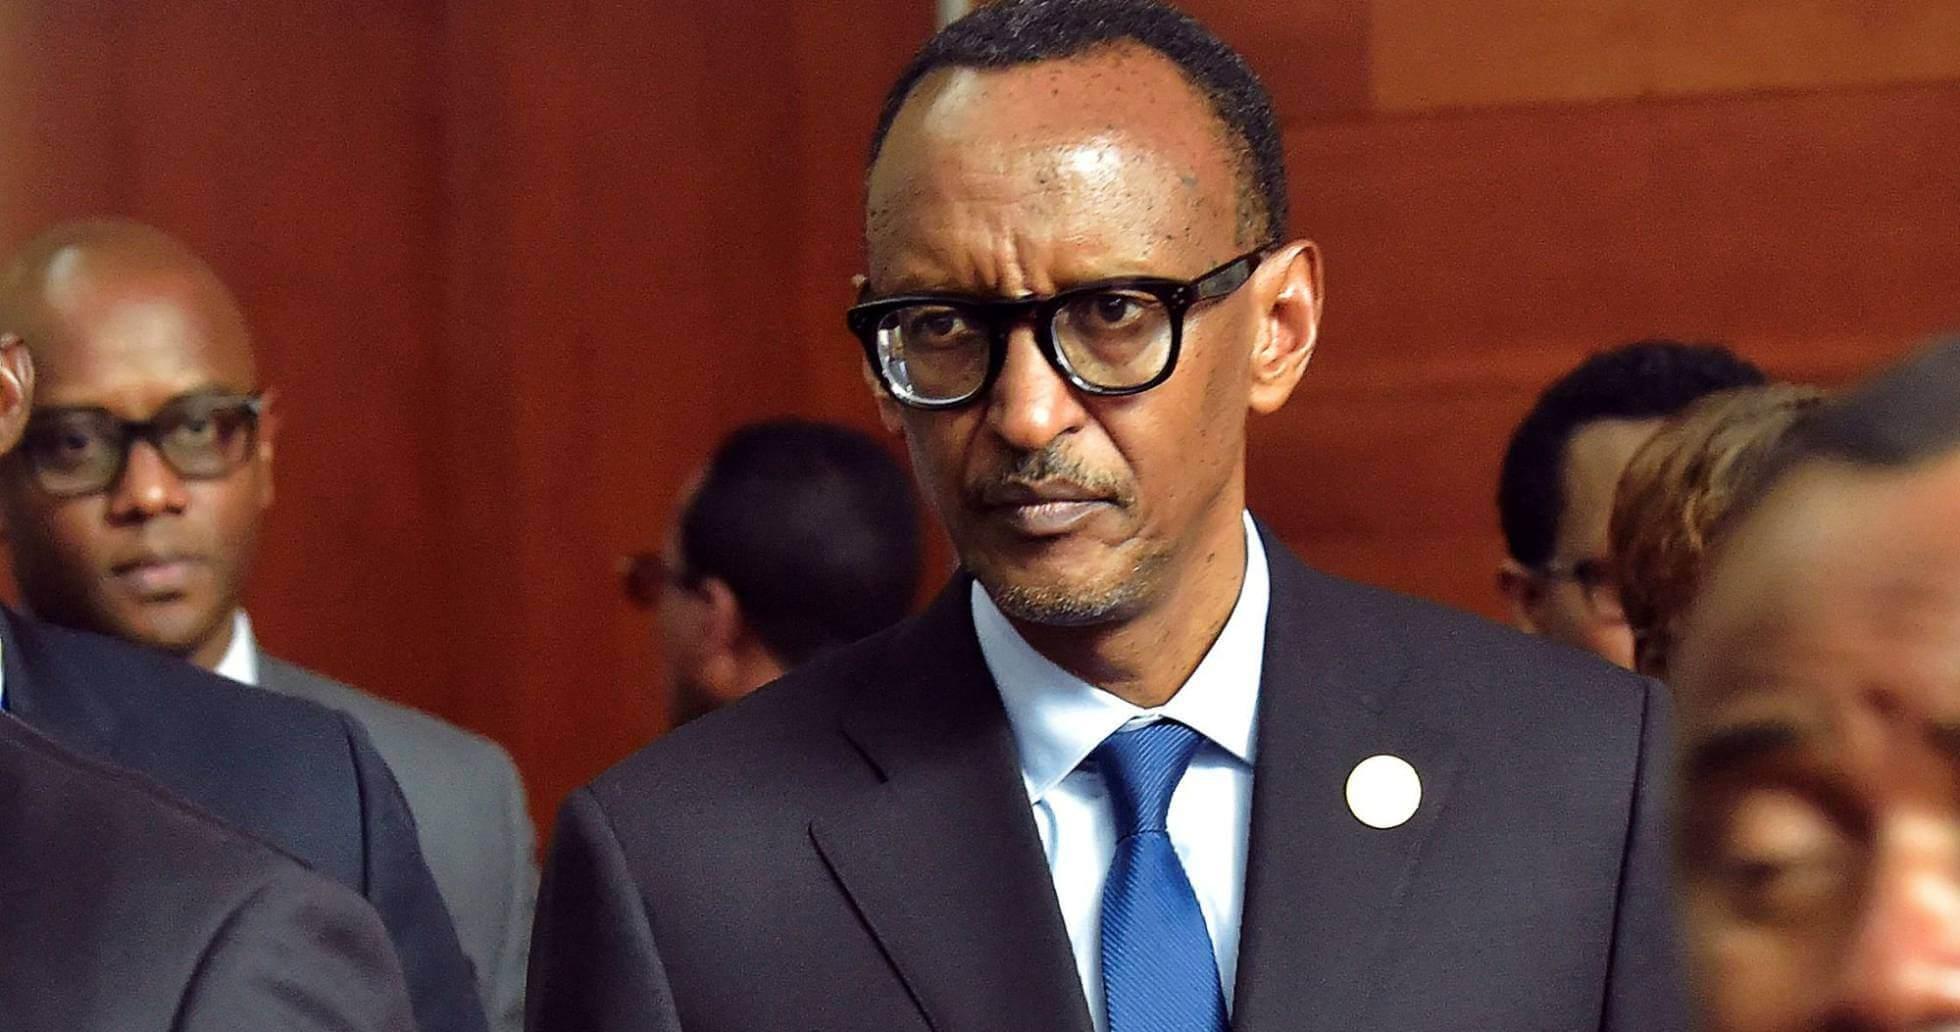 El presidente ruandés Paul Kagame, durante la asamblea de la Unión Africana en Addis Abeba. SIMON MAINA AFP